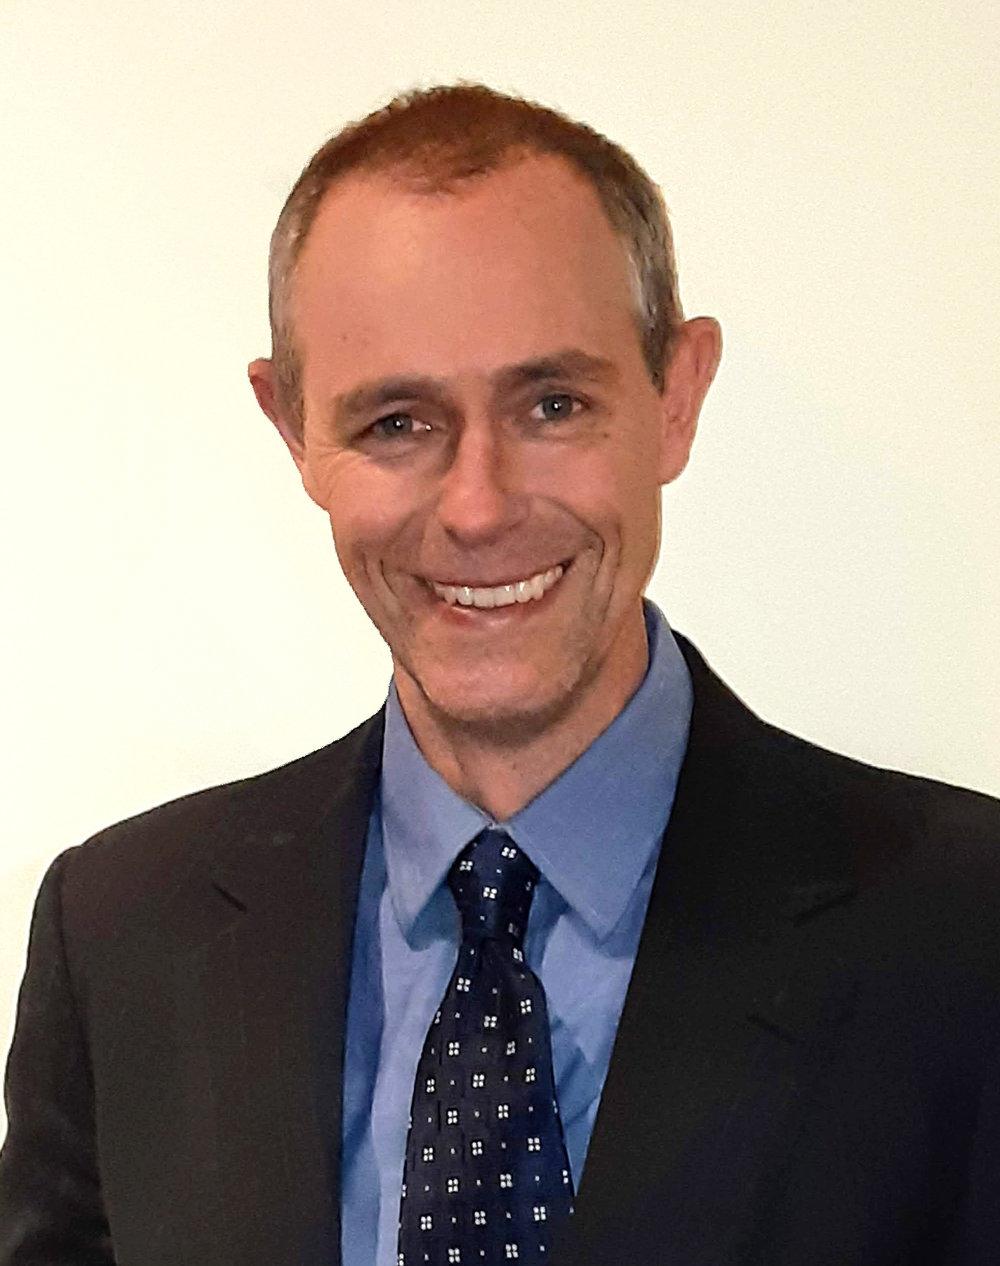 Dan Hein | West Campus Director